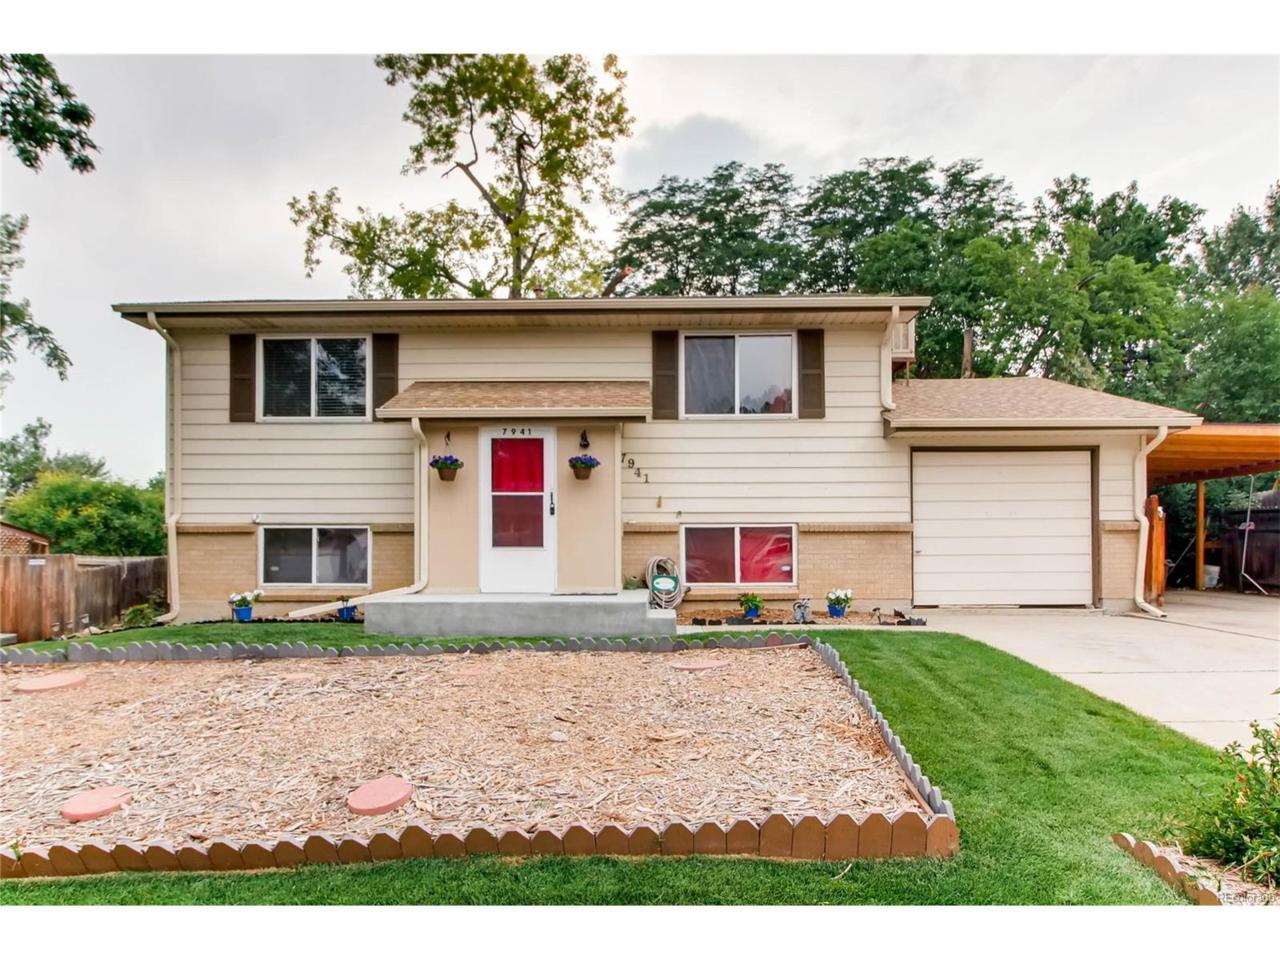 7941 Jay Street, Arvada, CO 80003 (MLS #2077370) :: 8z Real Estate